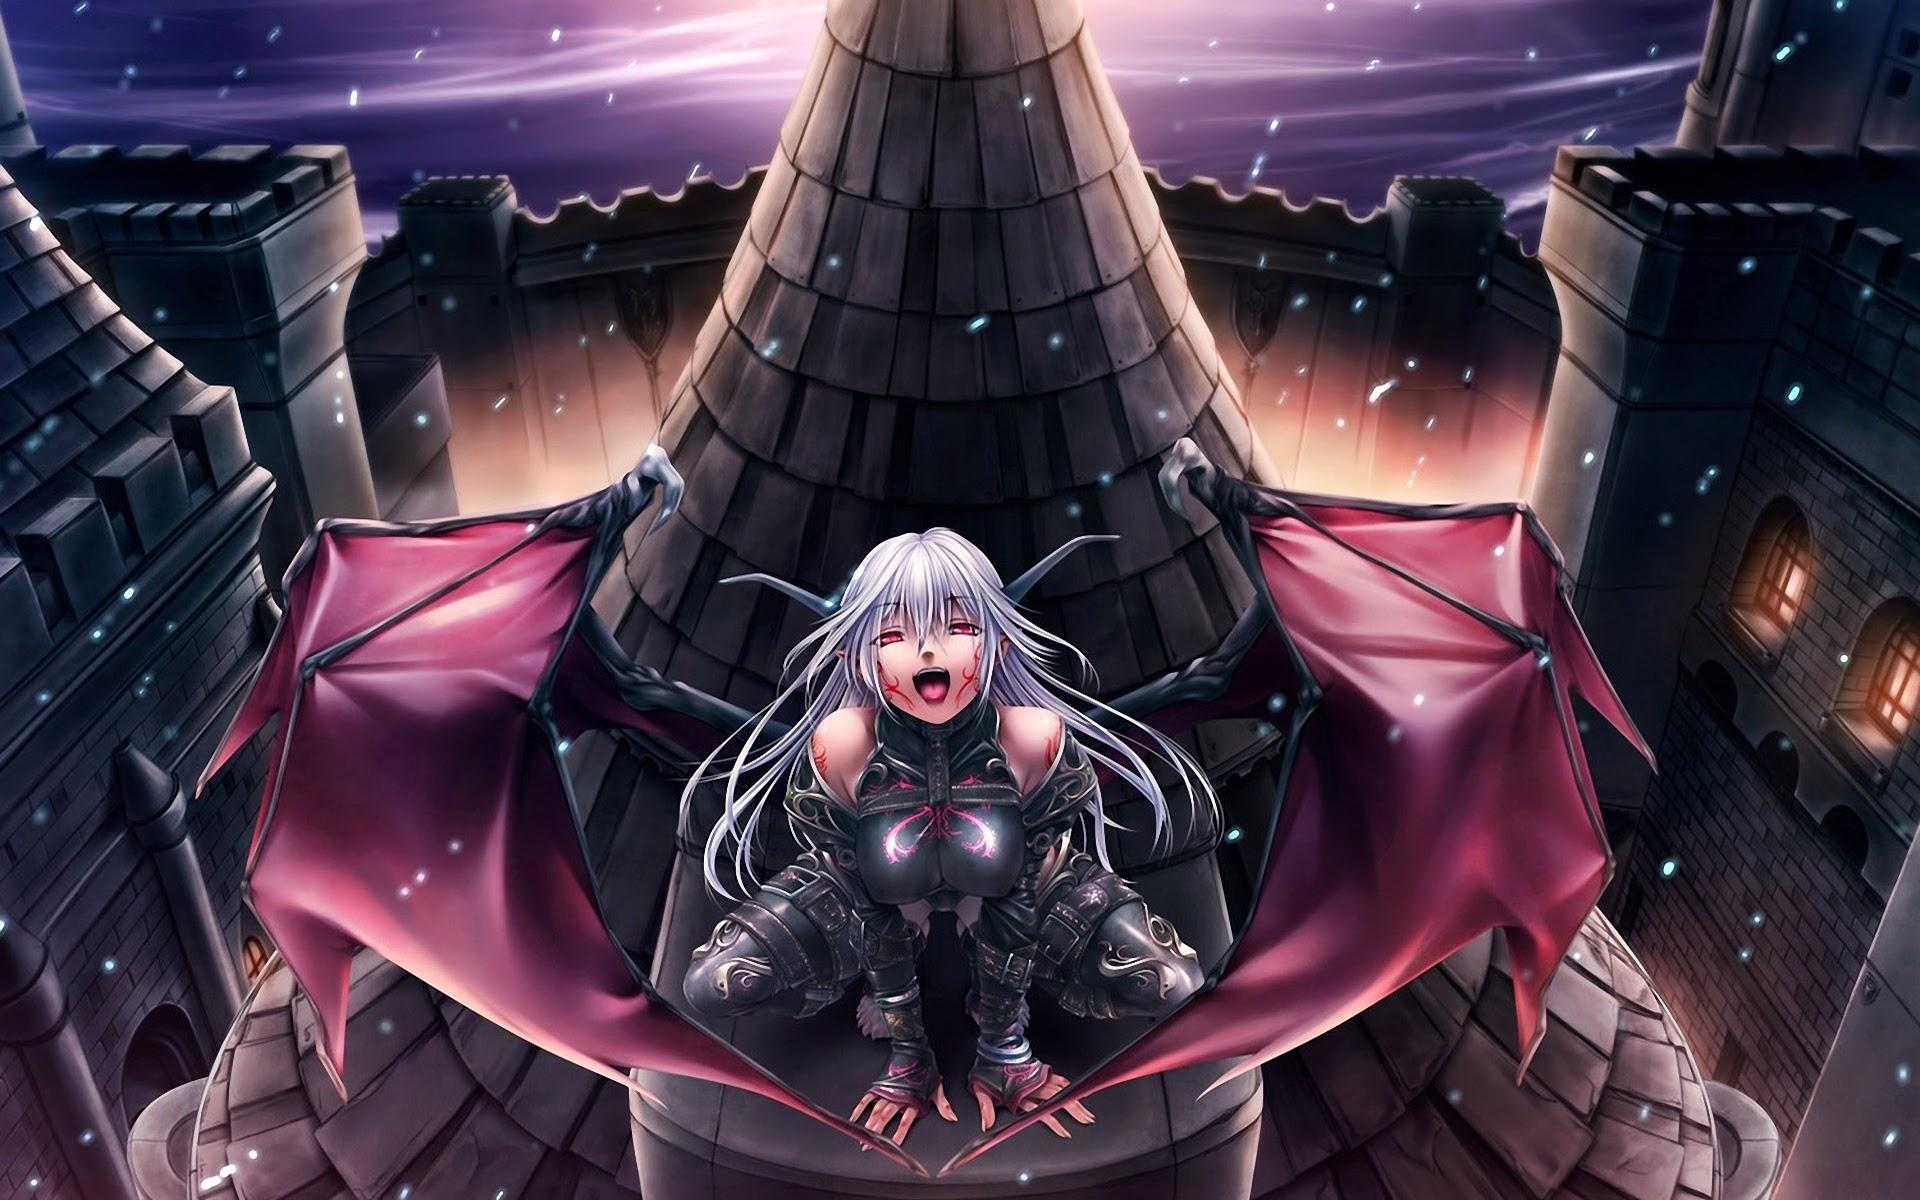 demon girl wings hd wallpaper horn anime 1920x1200 widescreen a546 1920x1200